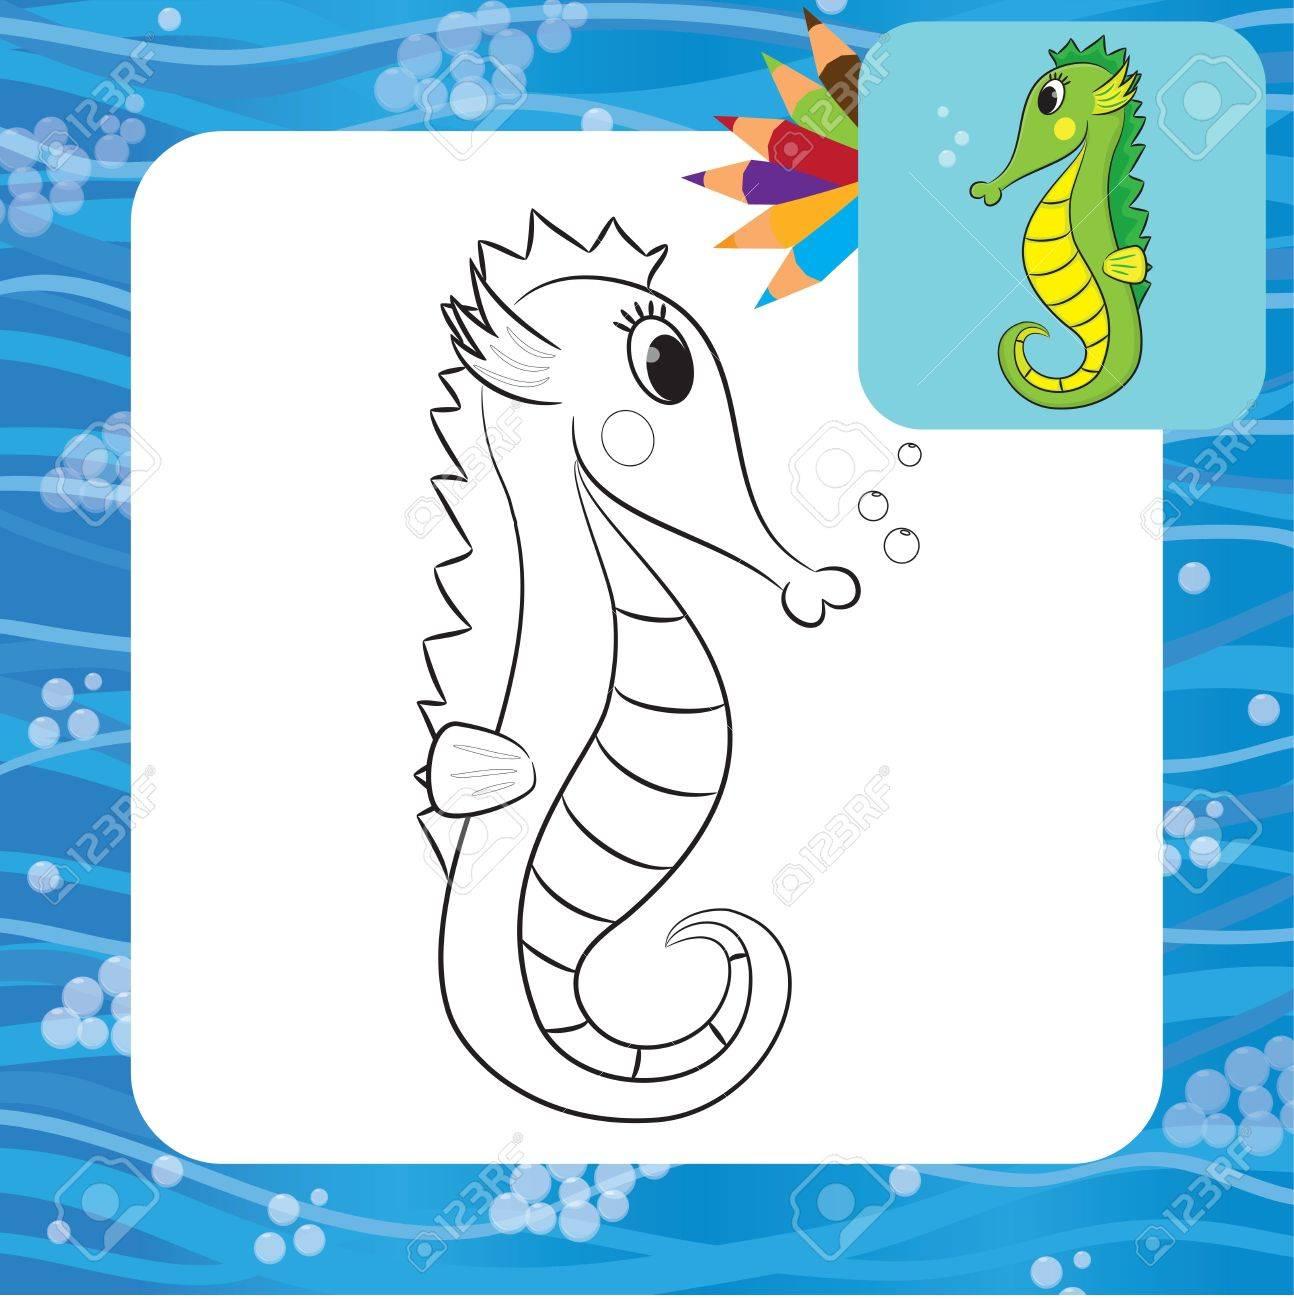 Cartoon Seahorse Coloring Page Vector Illustration Royalty Free ...